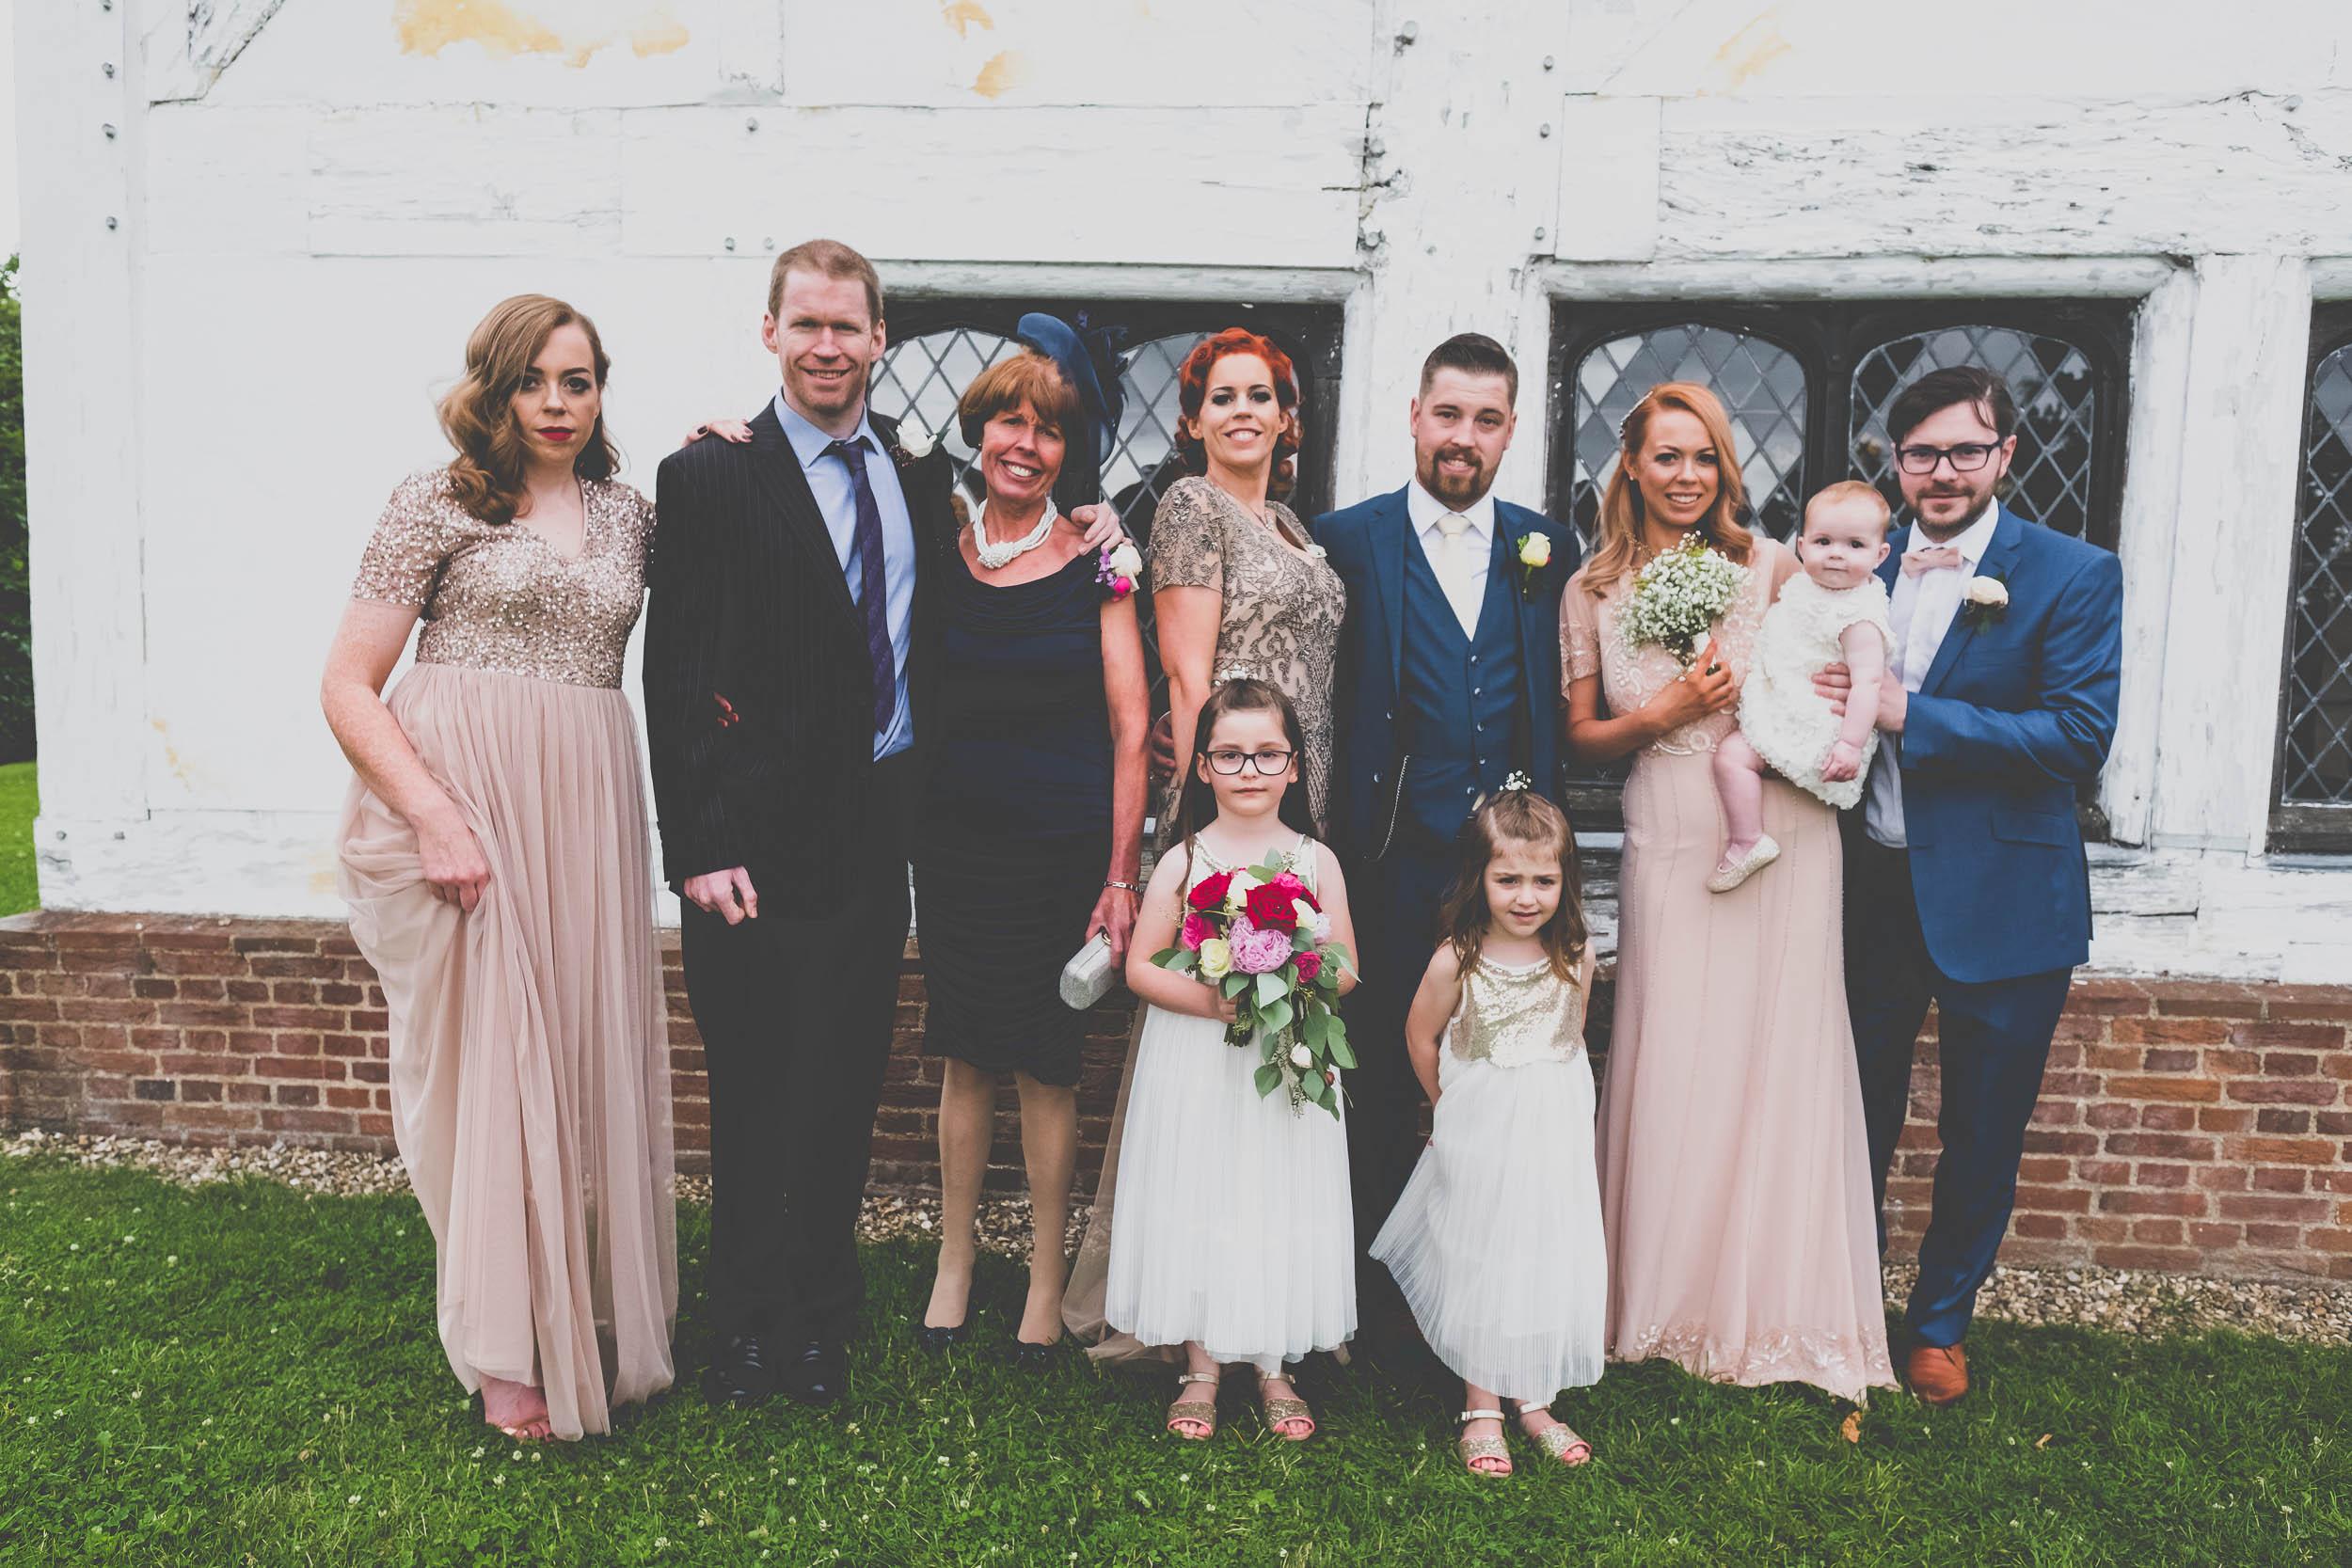 queen-elizabeths-hunting-lodge-epping-forest-wedding178.jpg